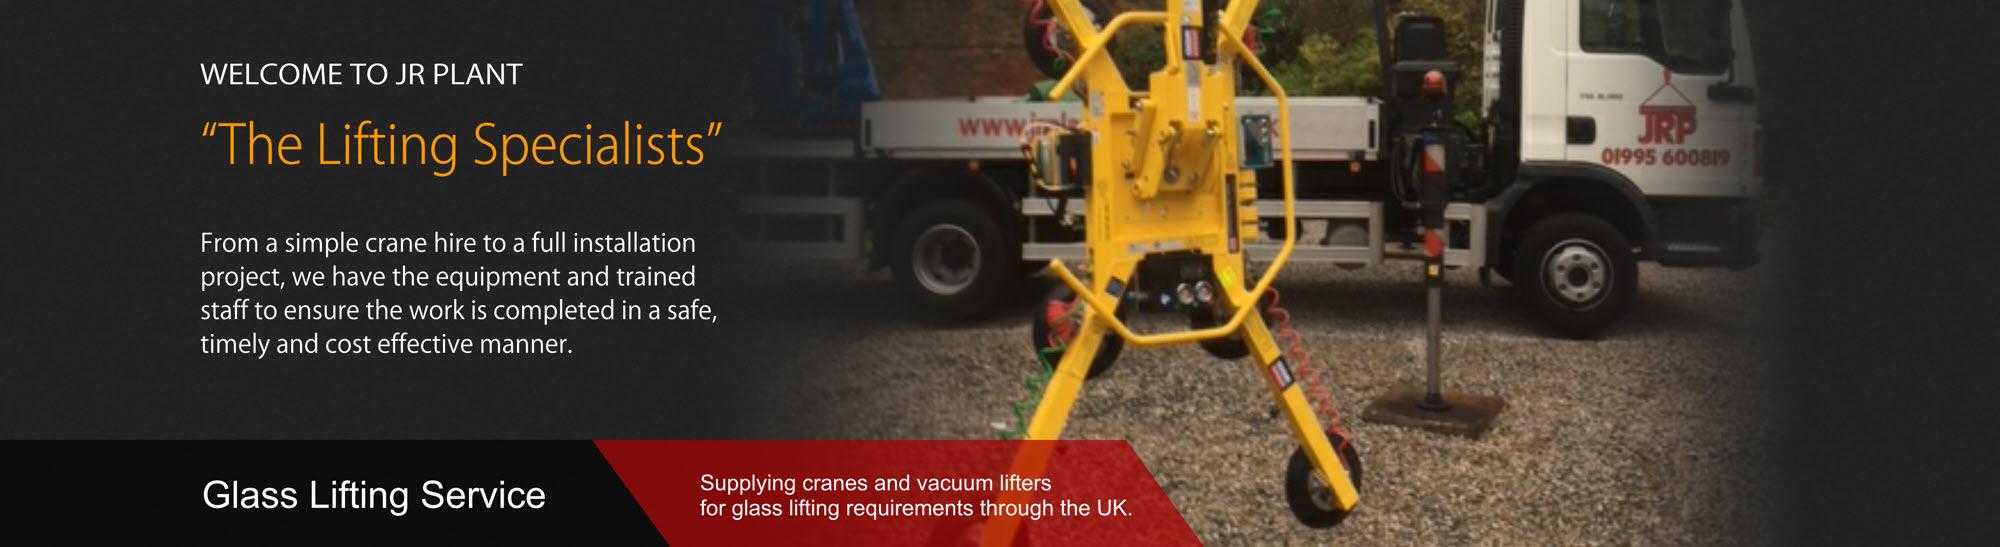 glass lifting crane hire lancashire